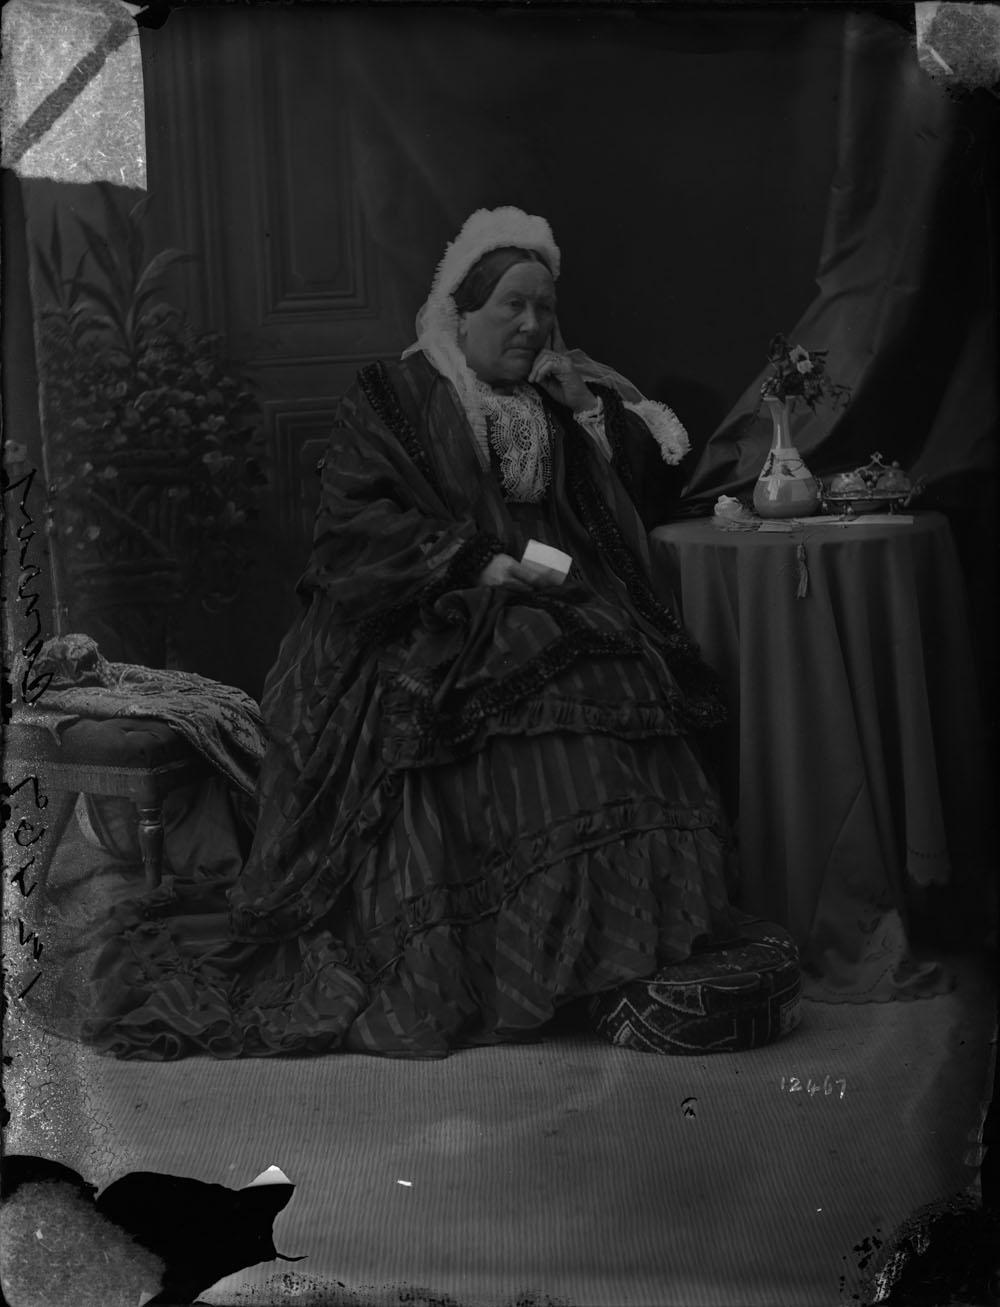 Conroy, R. Mrs.- Bibliothèques et Archives Canada- Photo : e010953798-v8, MIKAN # 3451003